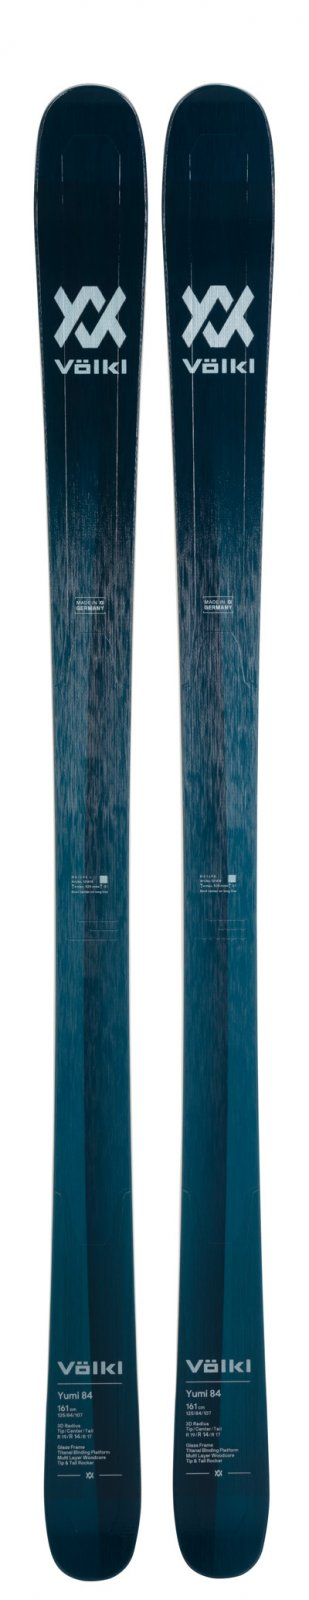 Volkl Yumi 84 Women's Ski